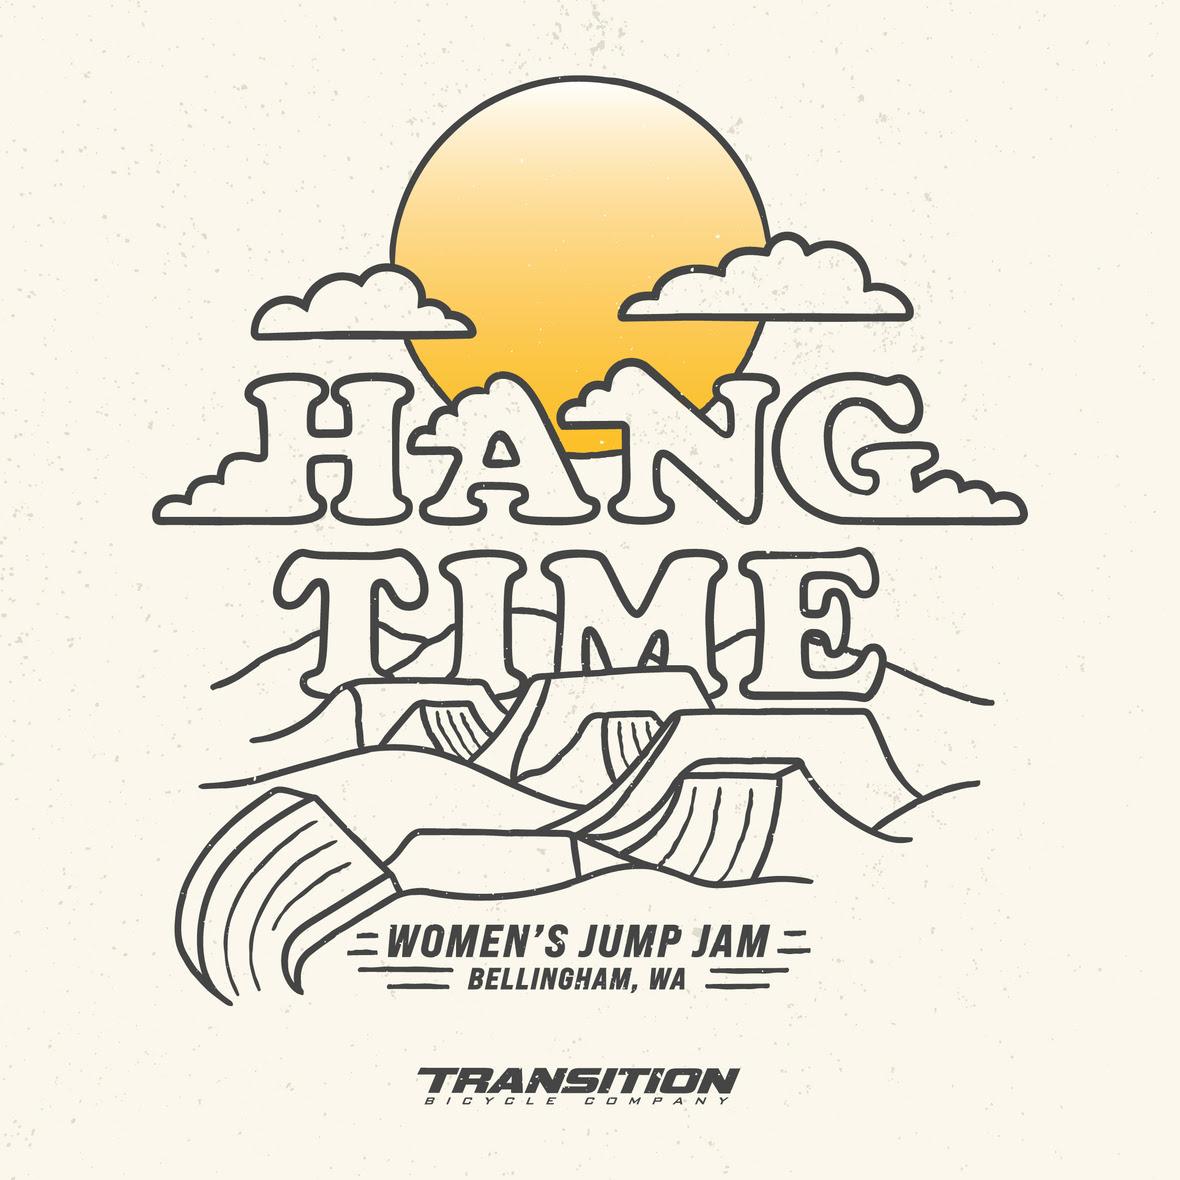 Hangtime Jump Jam - Bellingham Sept 4th With Hannah Bergman, Hangtime Jump Jam – Bellingham, WA Sept 4th With Hannah Bergman